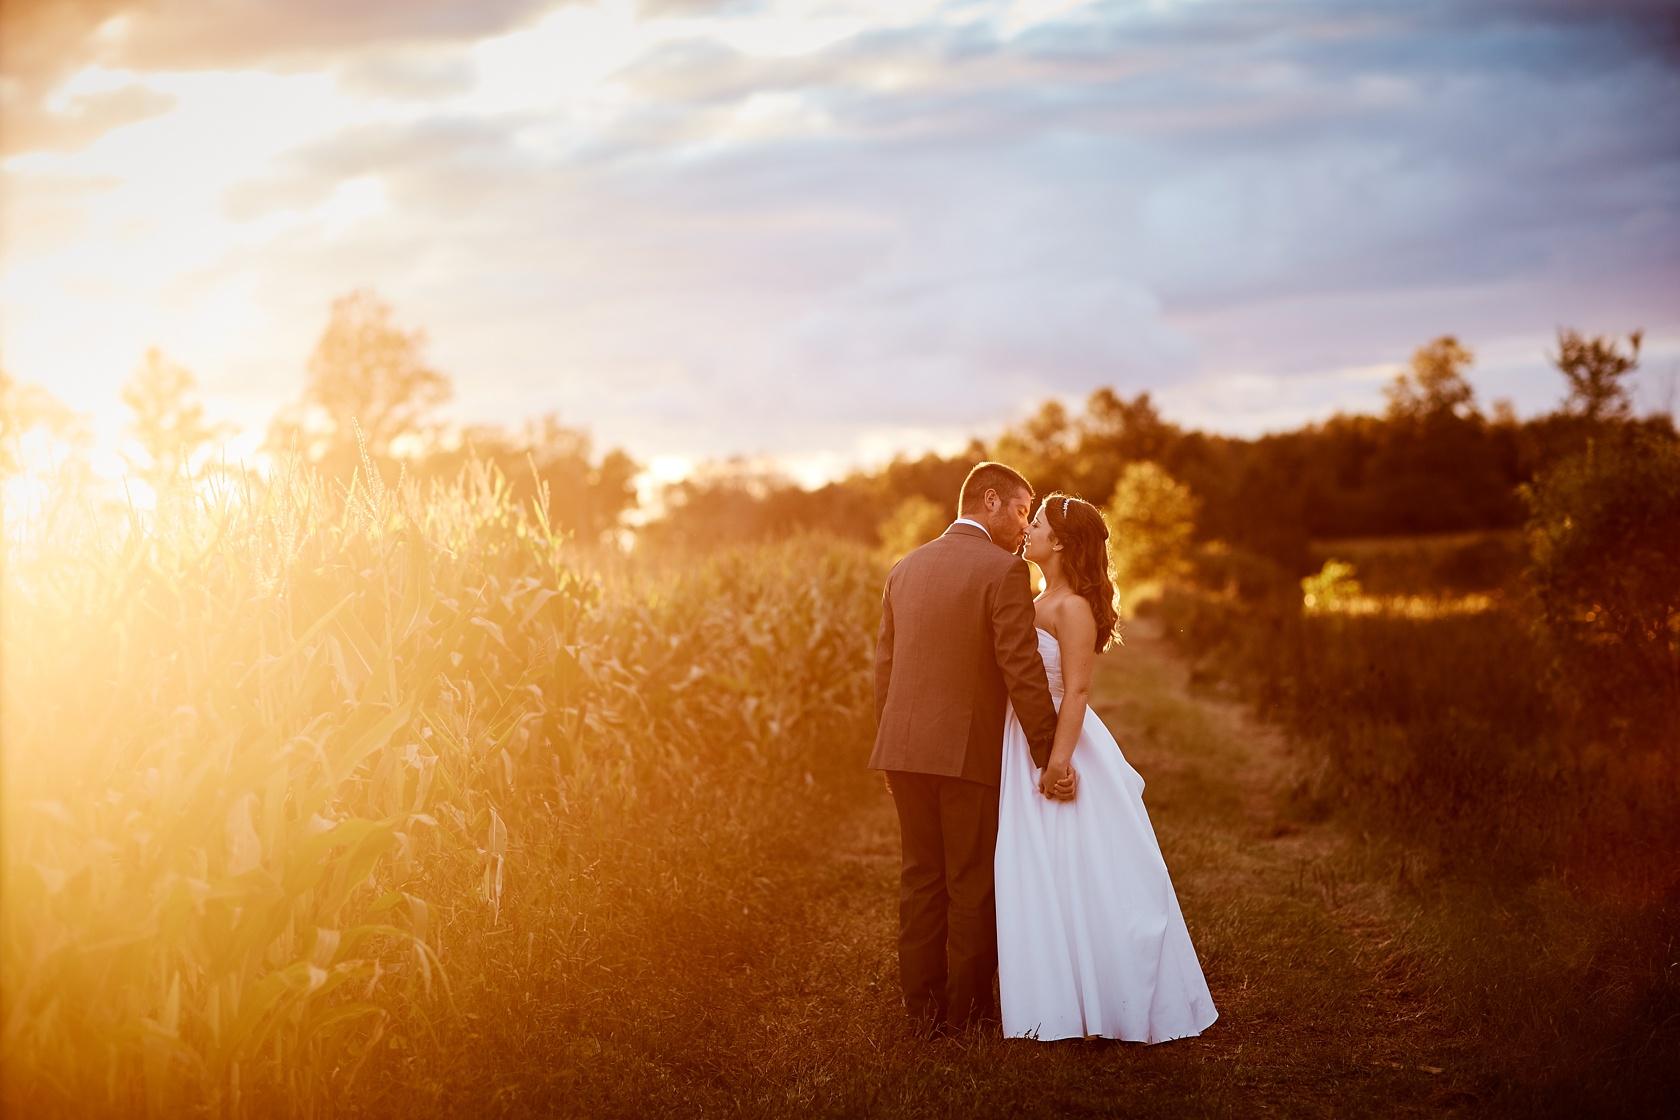 000017-farm-wedding-stephen-sager-photography